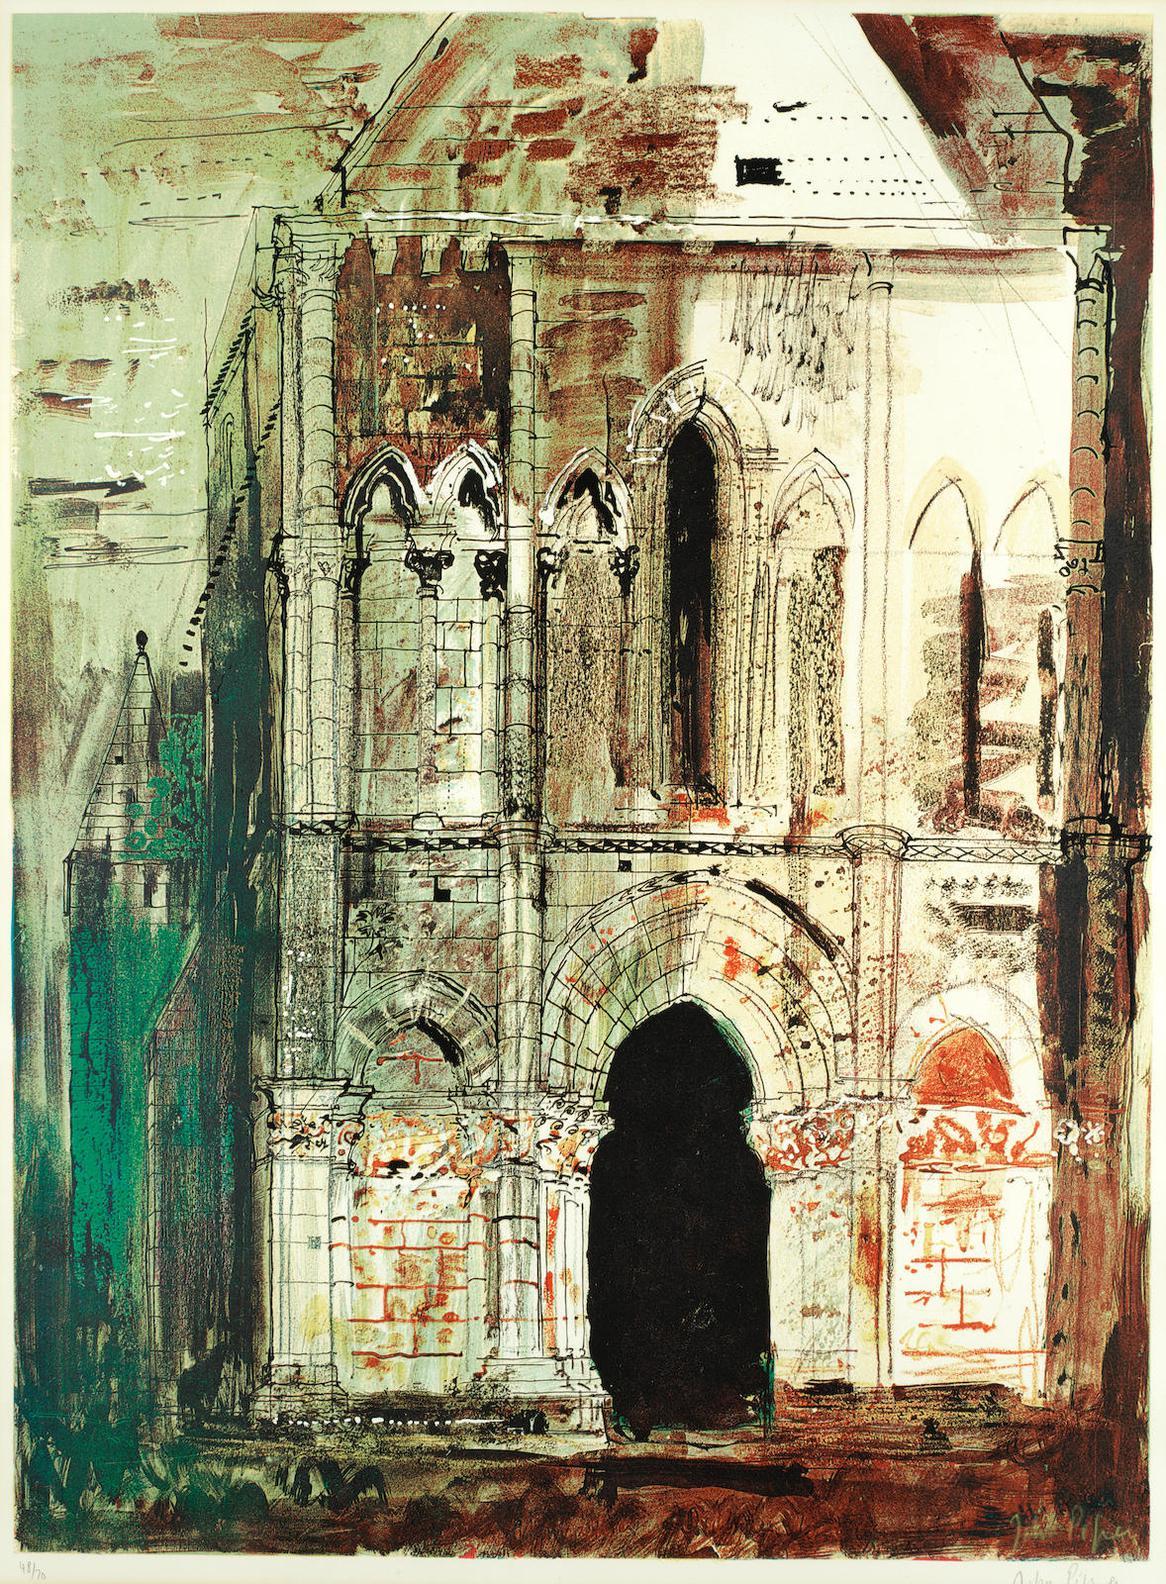 John Piper-Montpellier-De-Didonne, Charente-1968